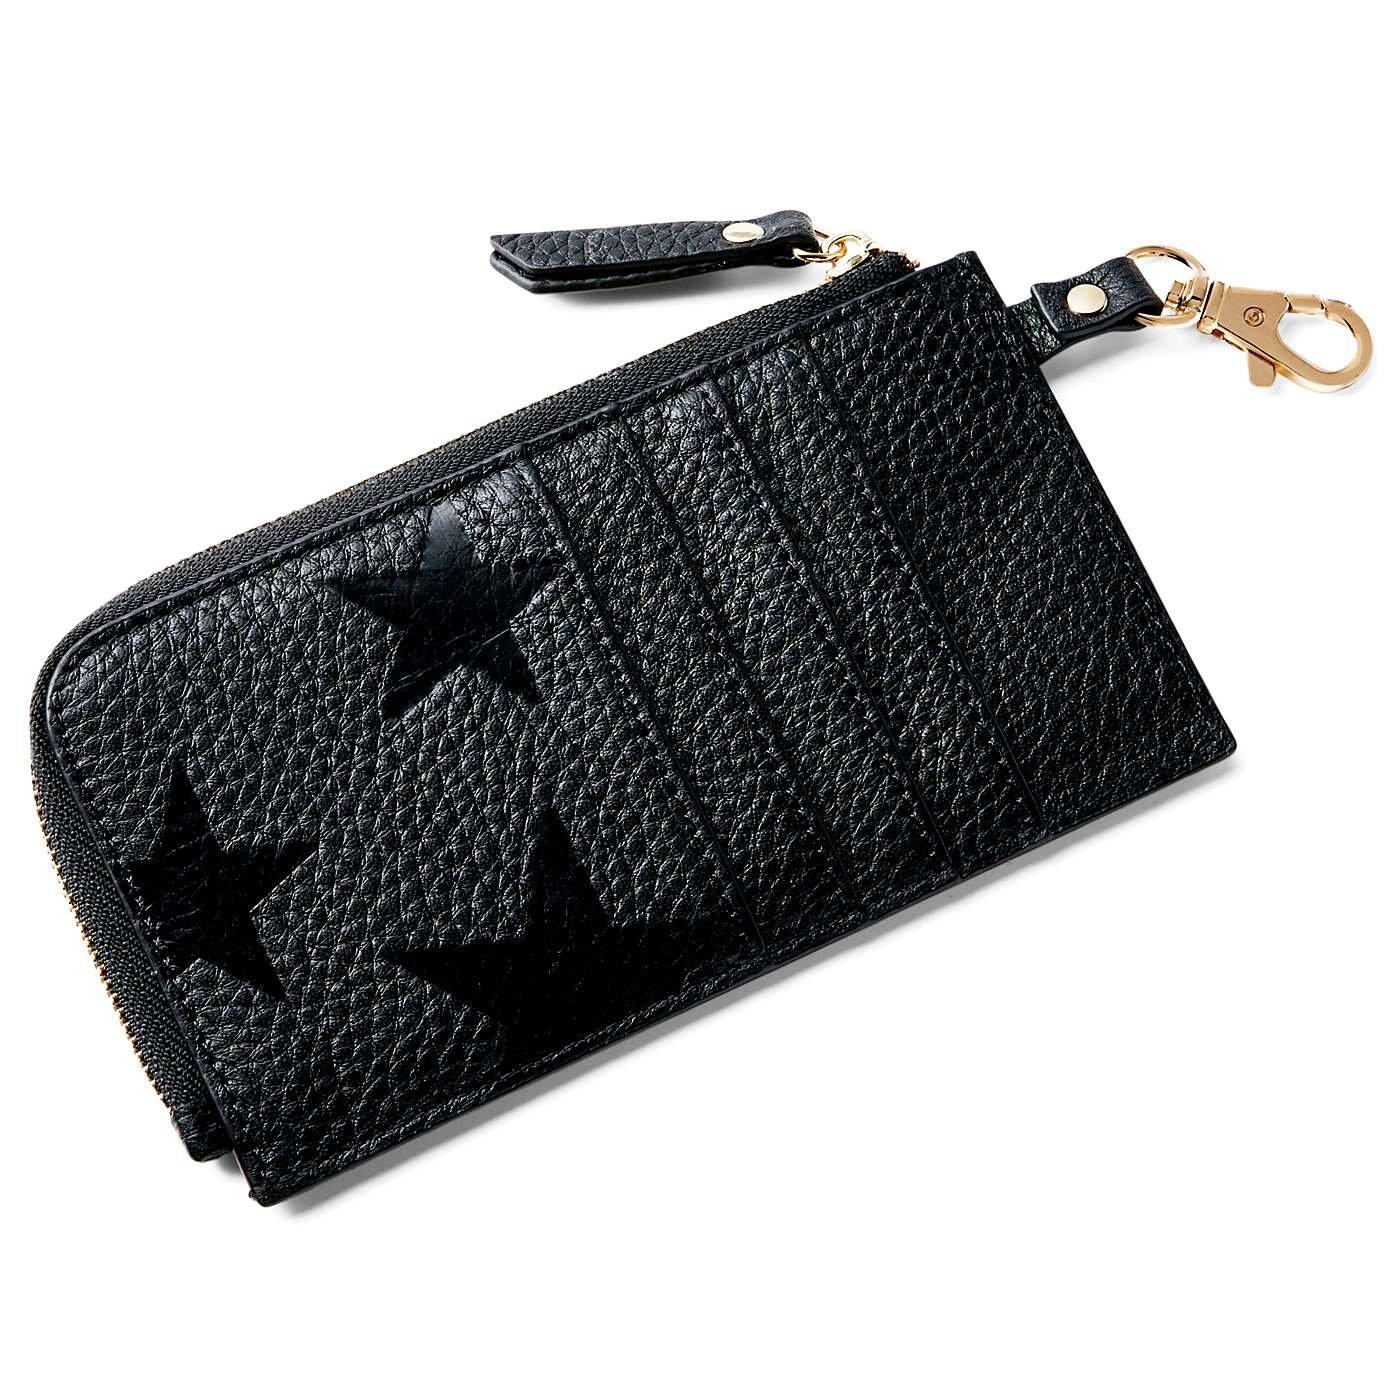 IEDIT 本革が大人にうれしい スターエンボス加工のスリムミニ財布〈ブラック〉